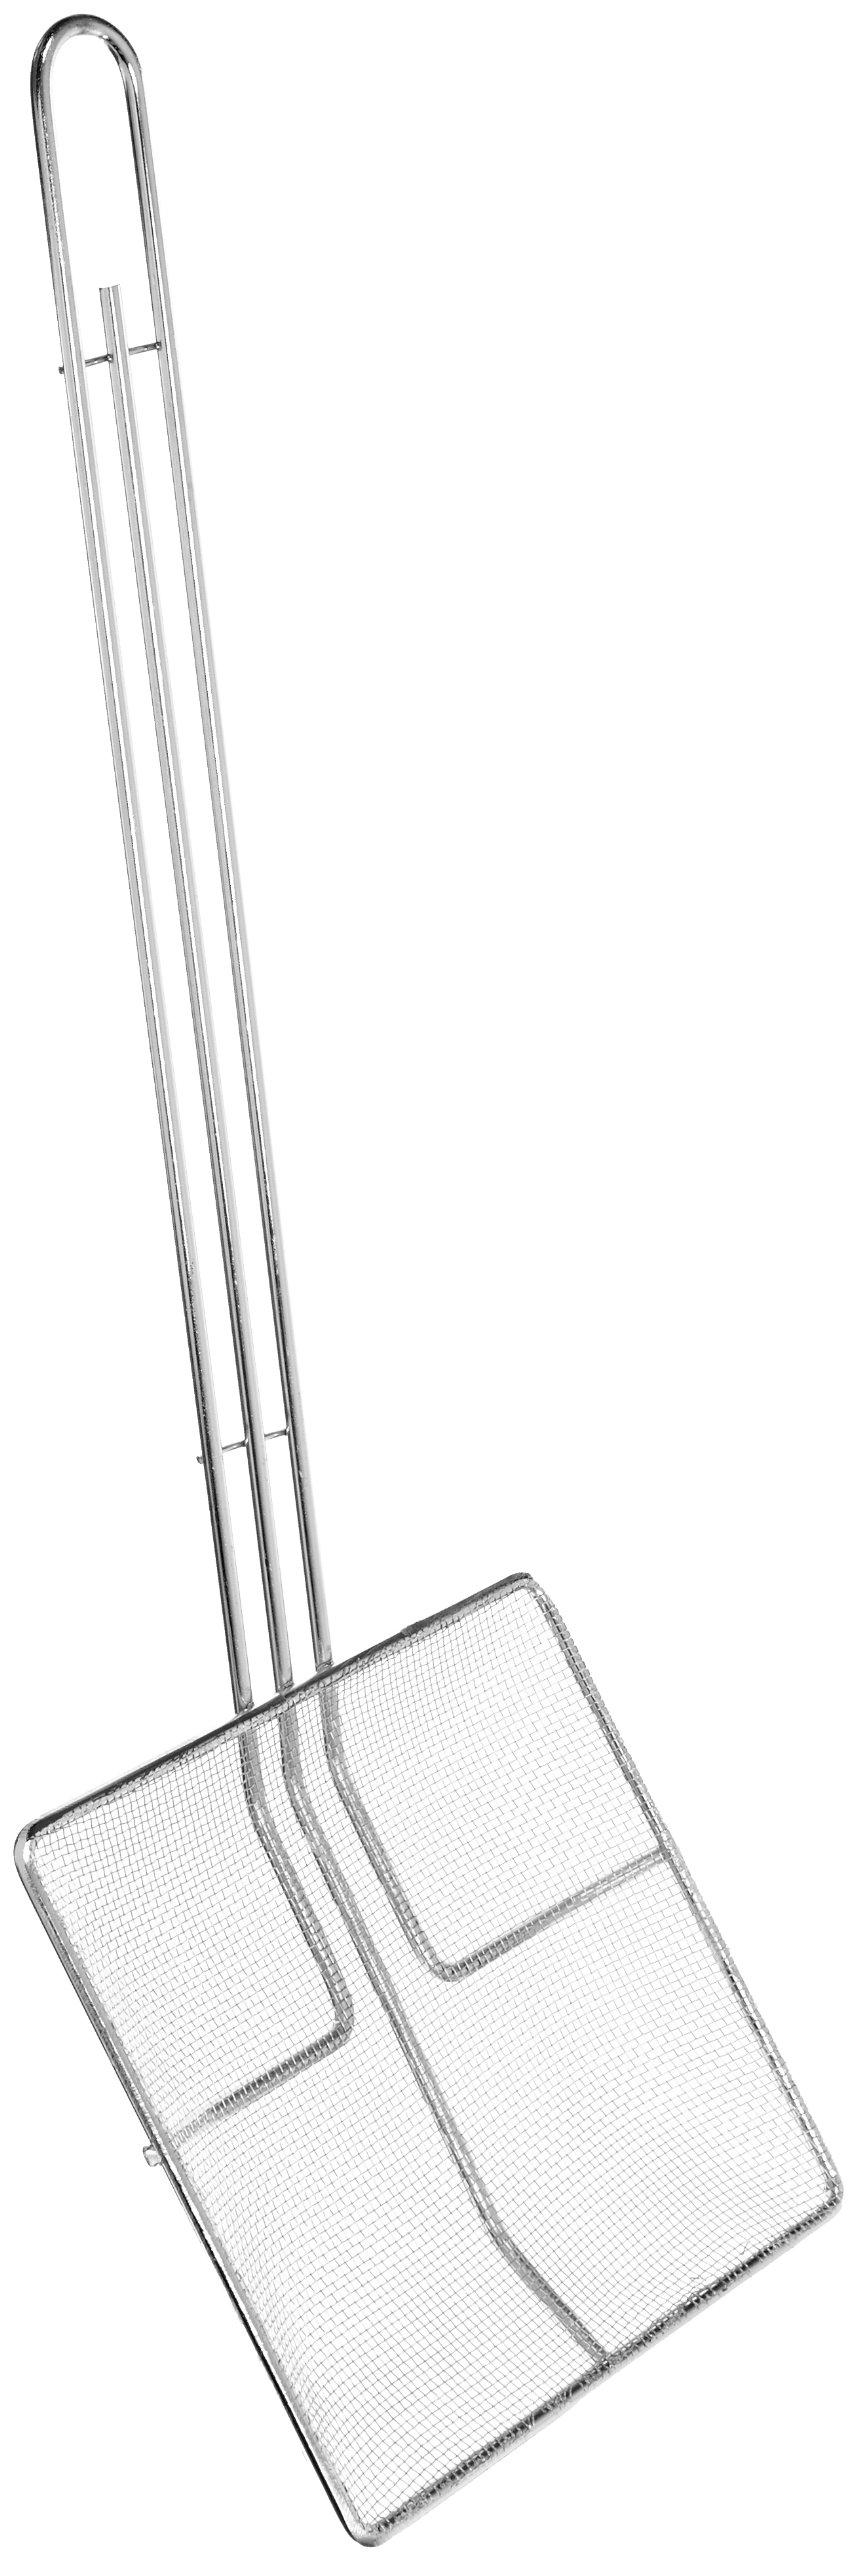 Crestware SKM7SM 6-3/4'' Square Screen Mesh Skimmer